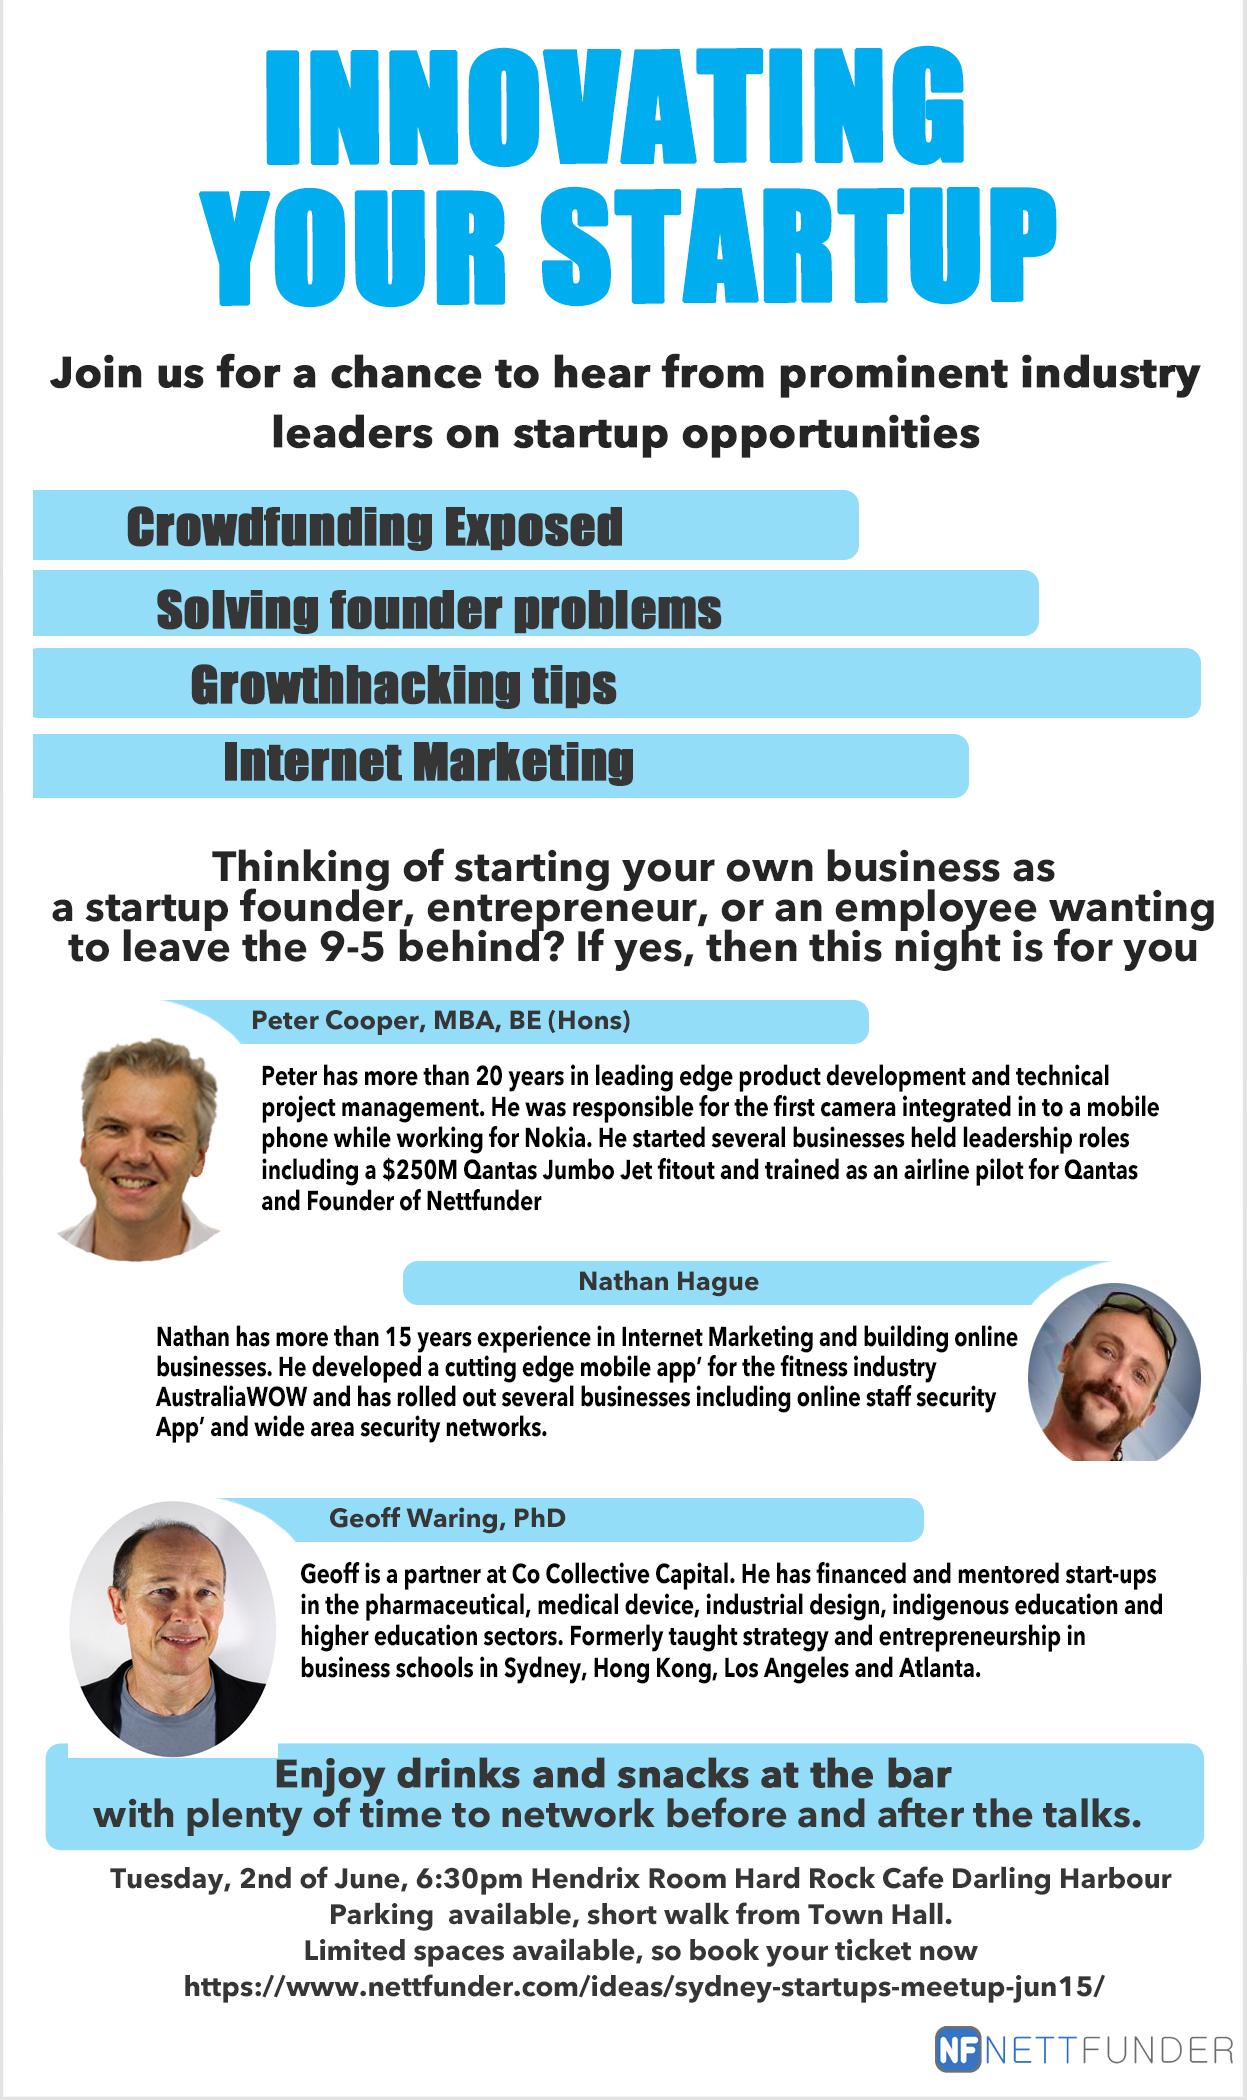 InnovatingYourStartUp_June15